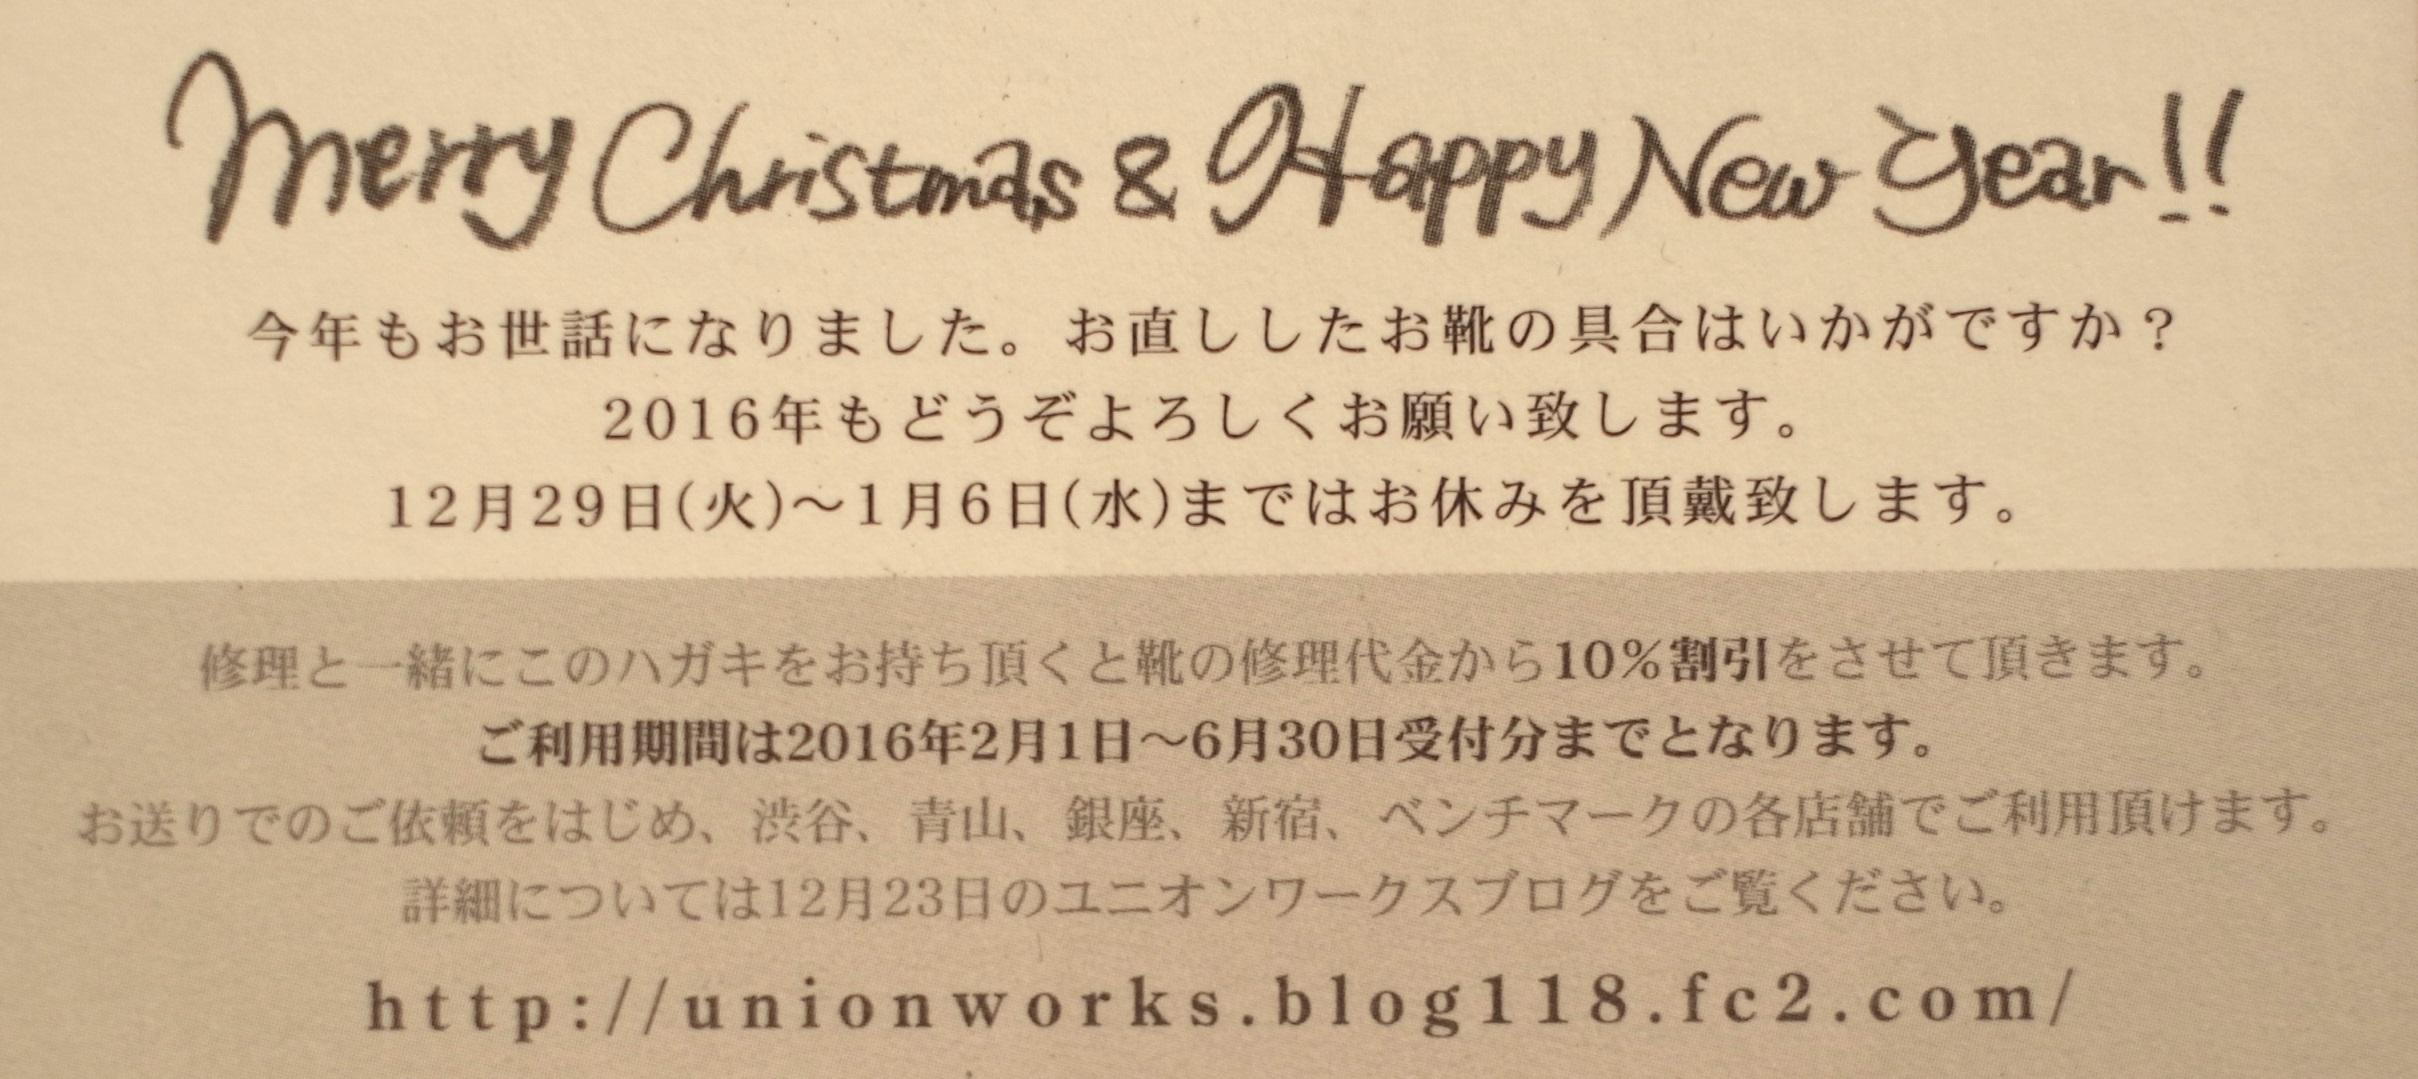 R0016830 - コピー